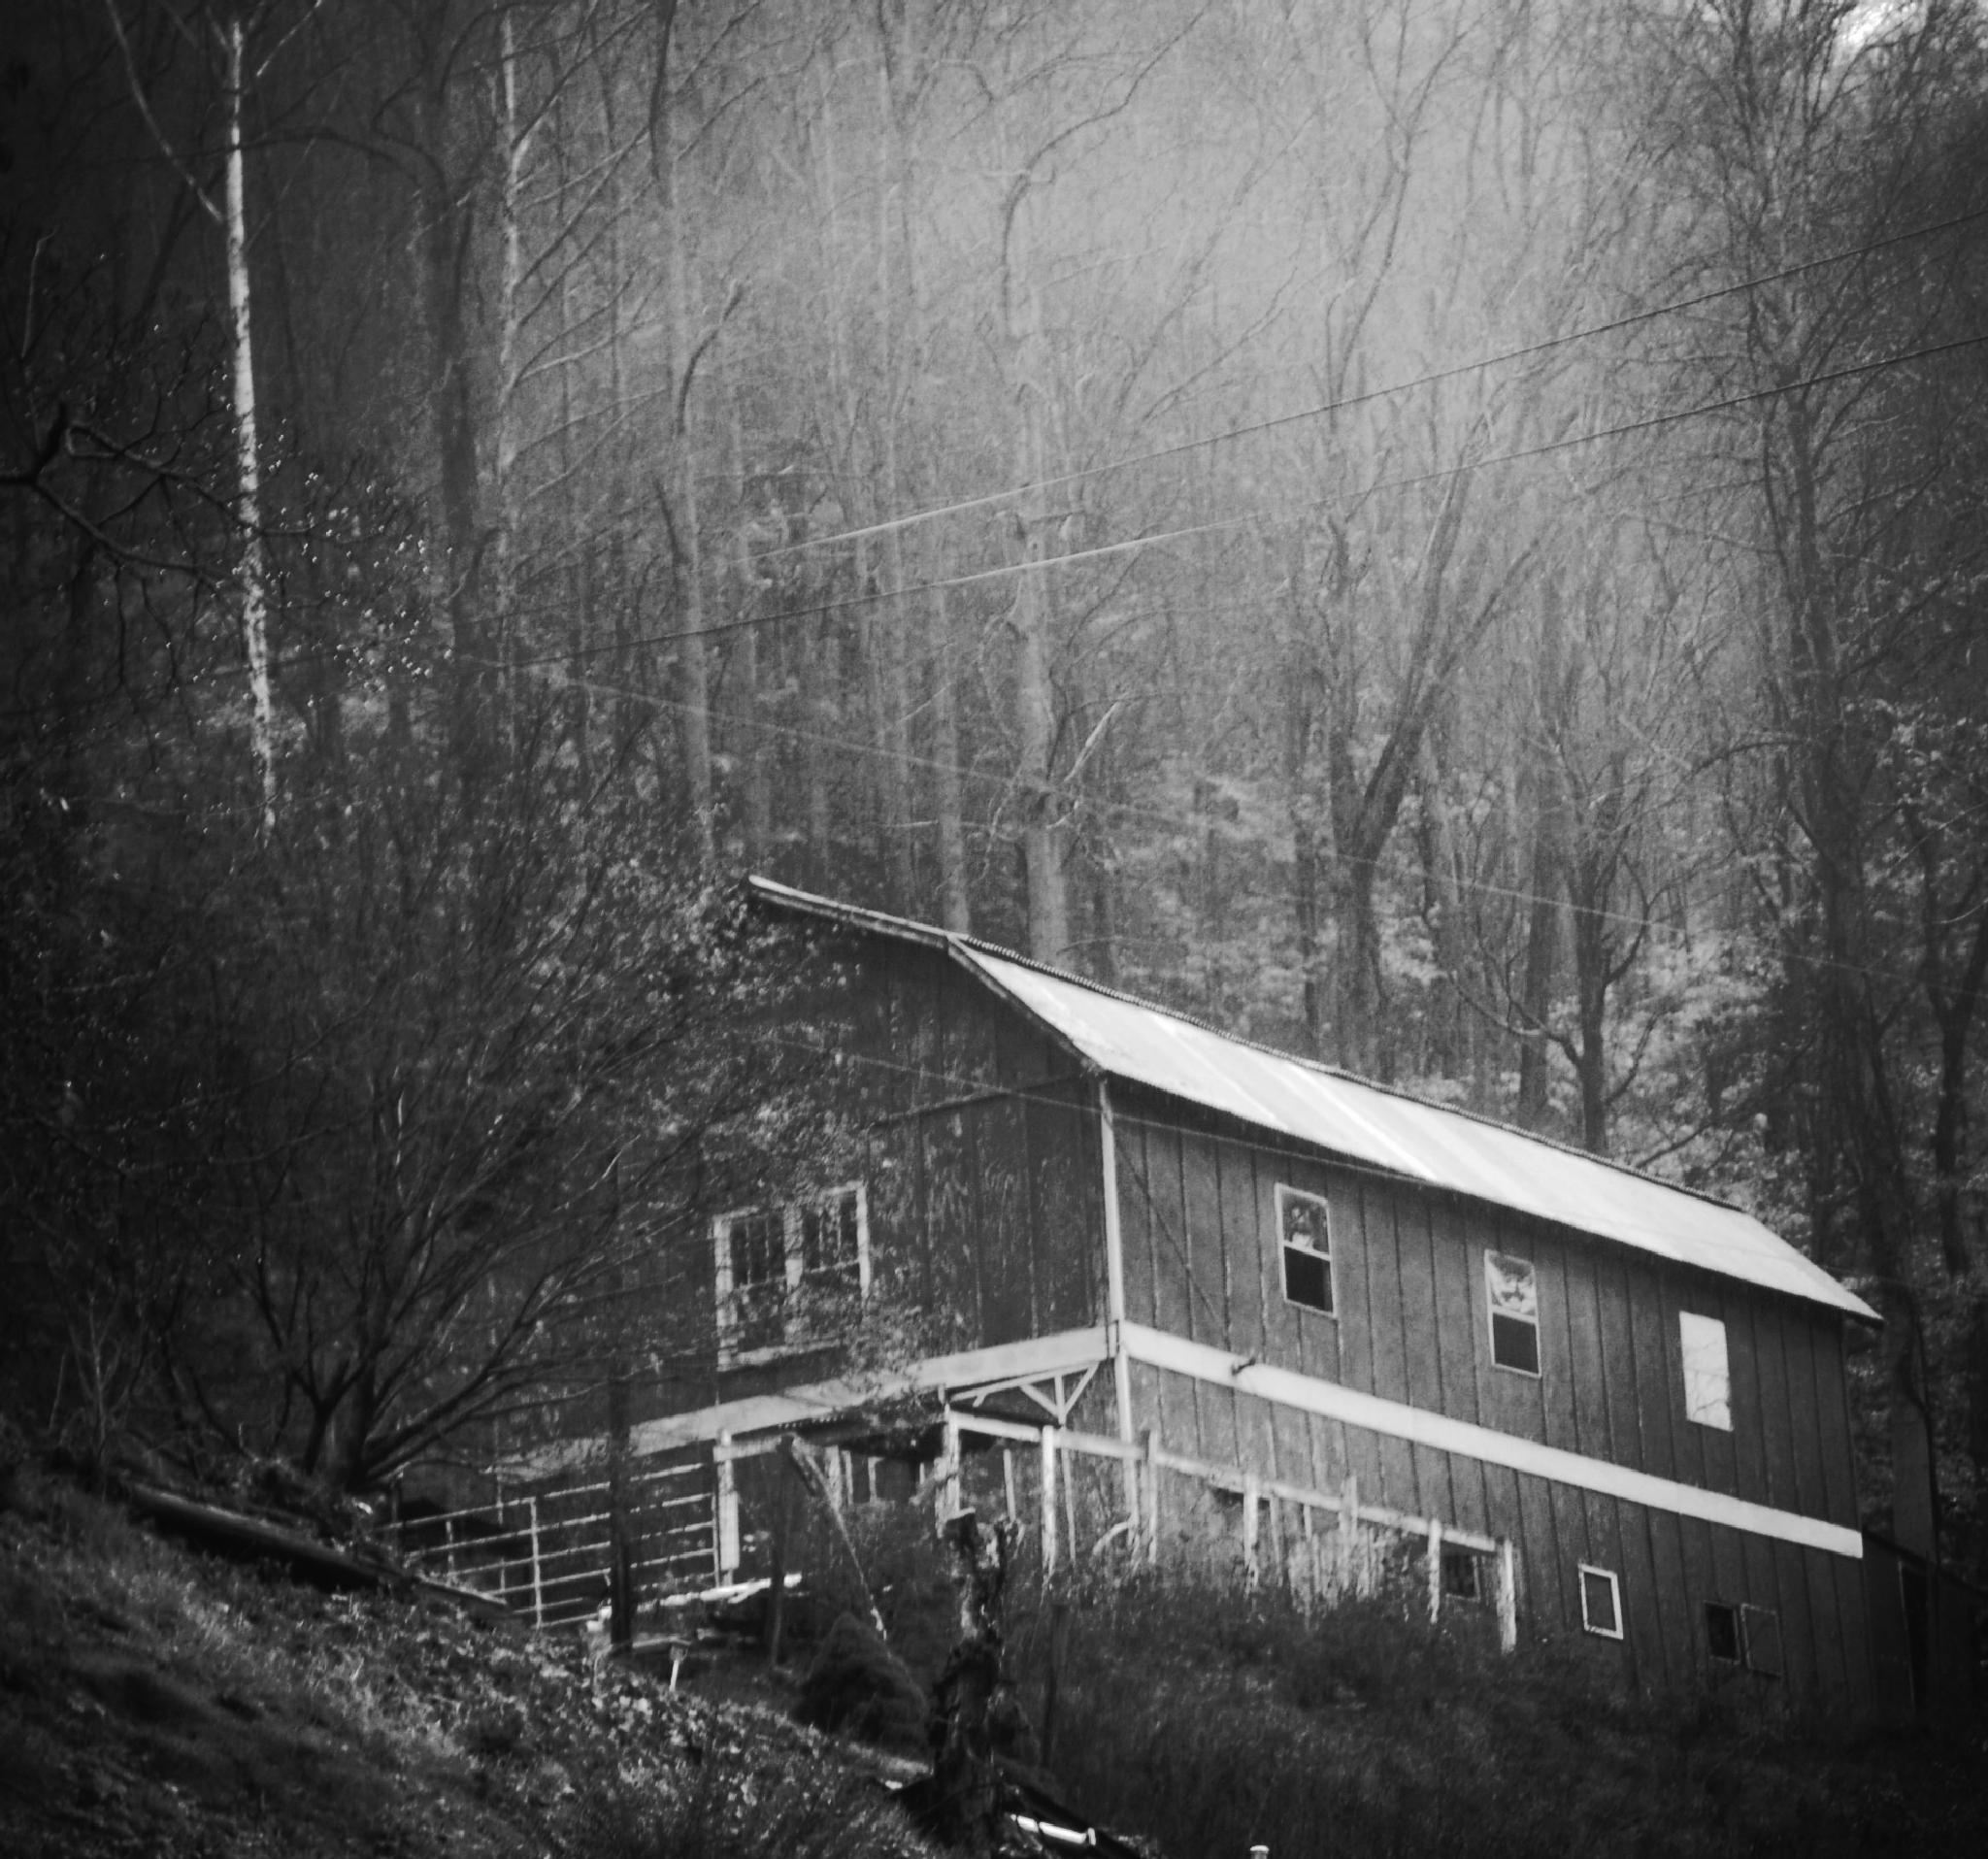 Old Barn by lindandarrell